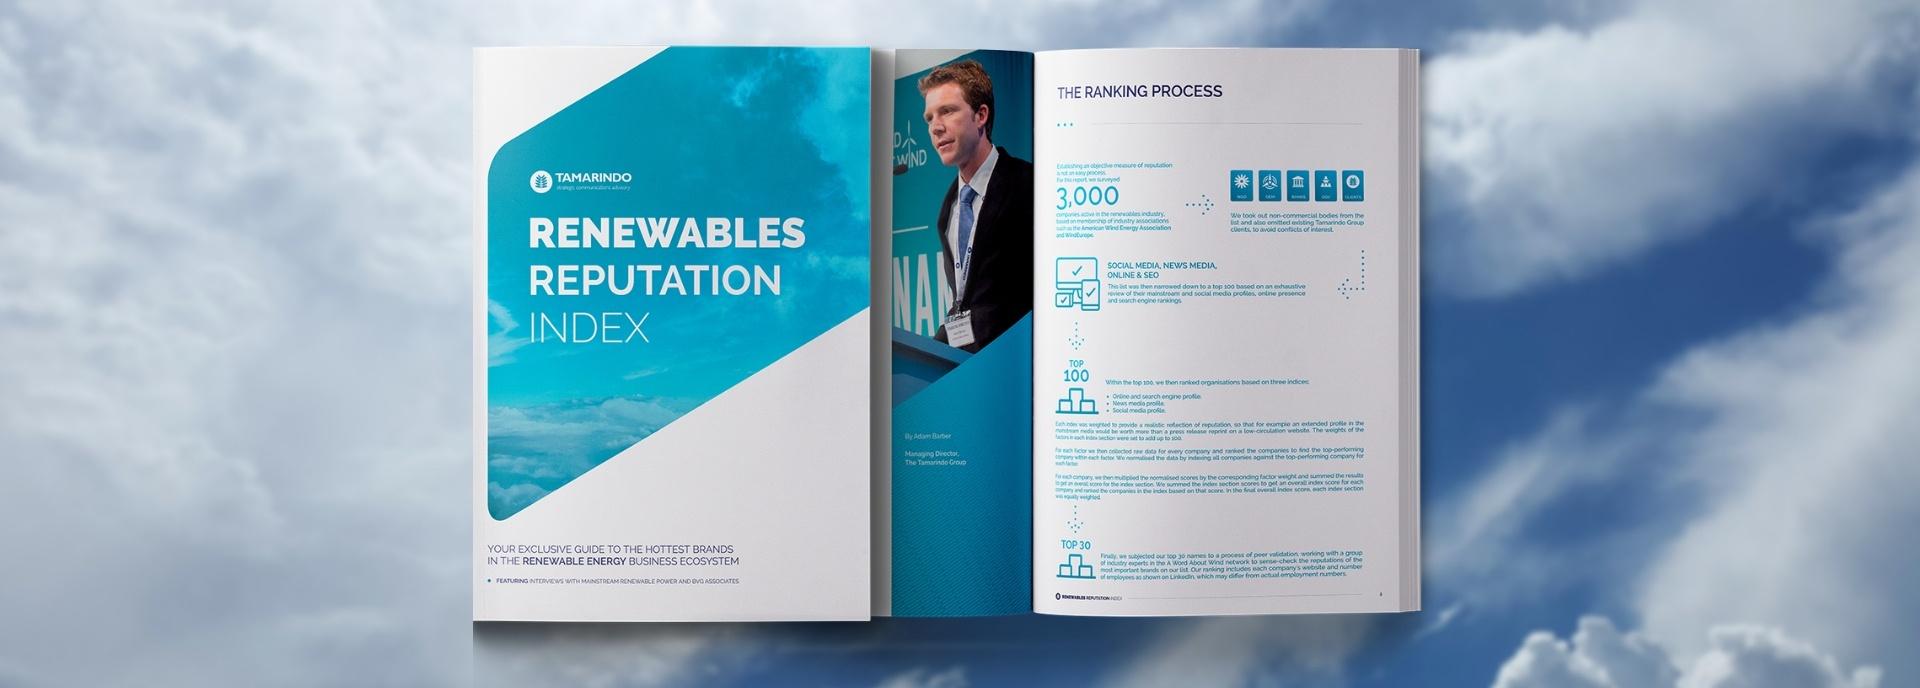 Renewables Reputation Index report